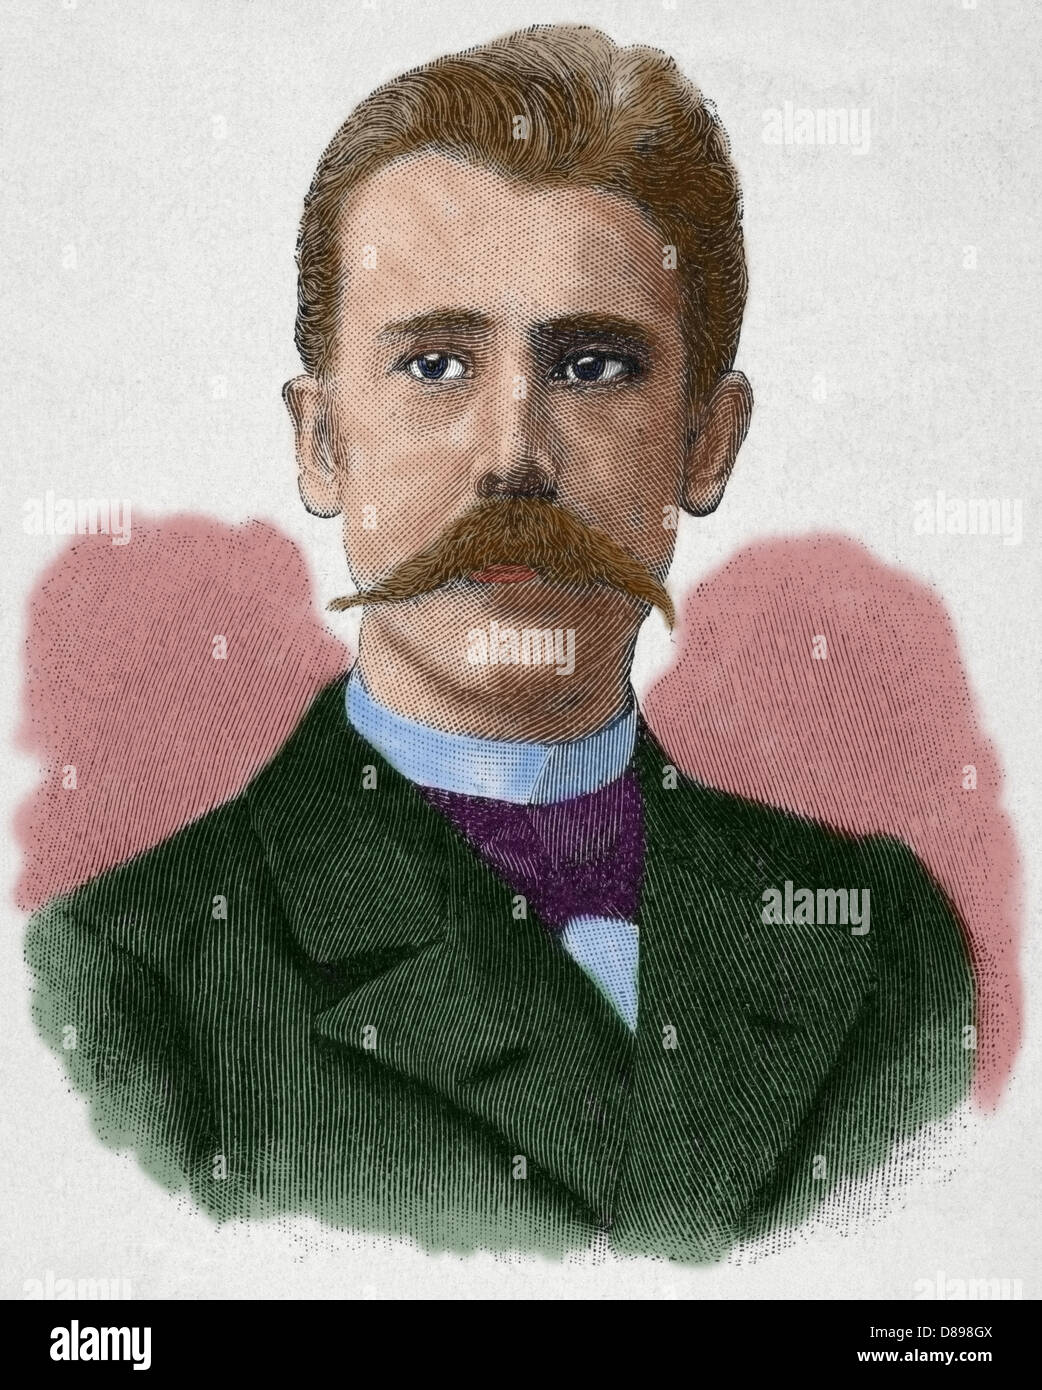 Per Hallstrom (1866-1960). Swedish author, short-story writer, dramatist, poet and member of the Swedish Academy. - Stock Image